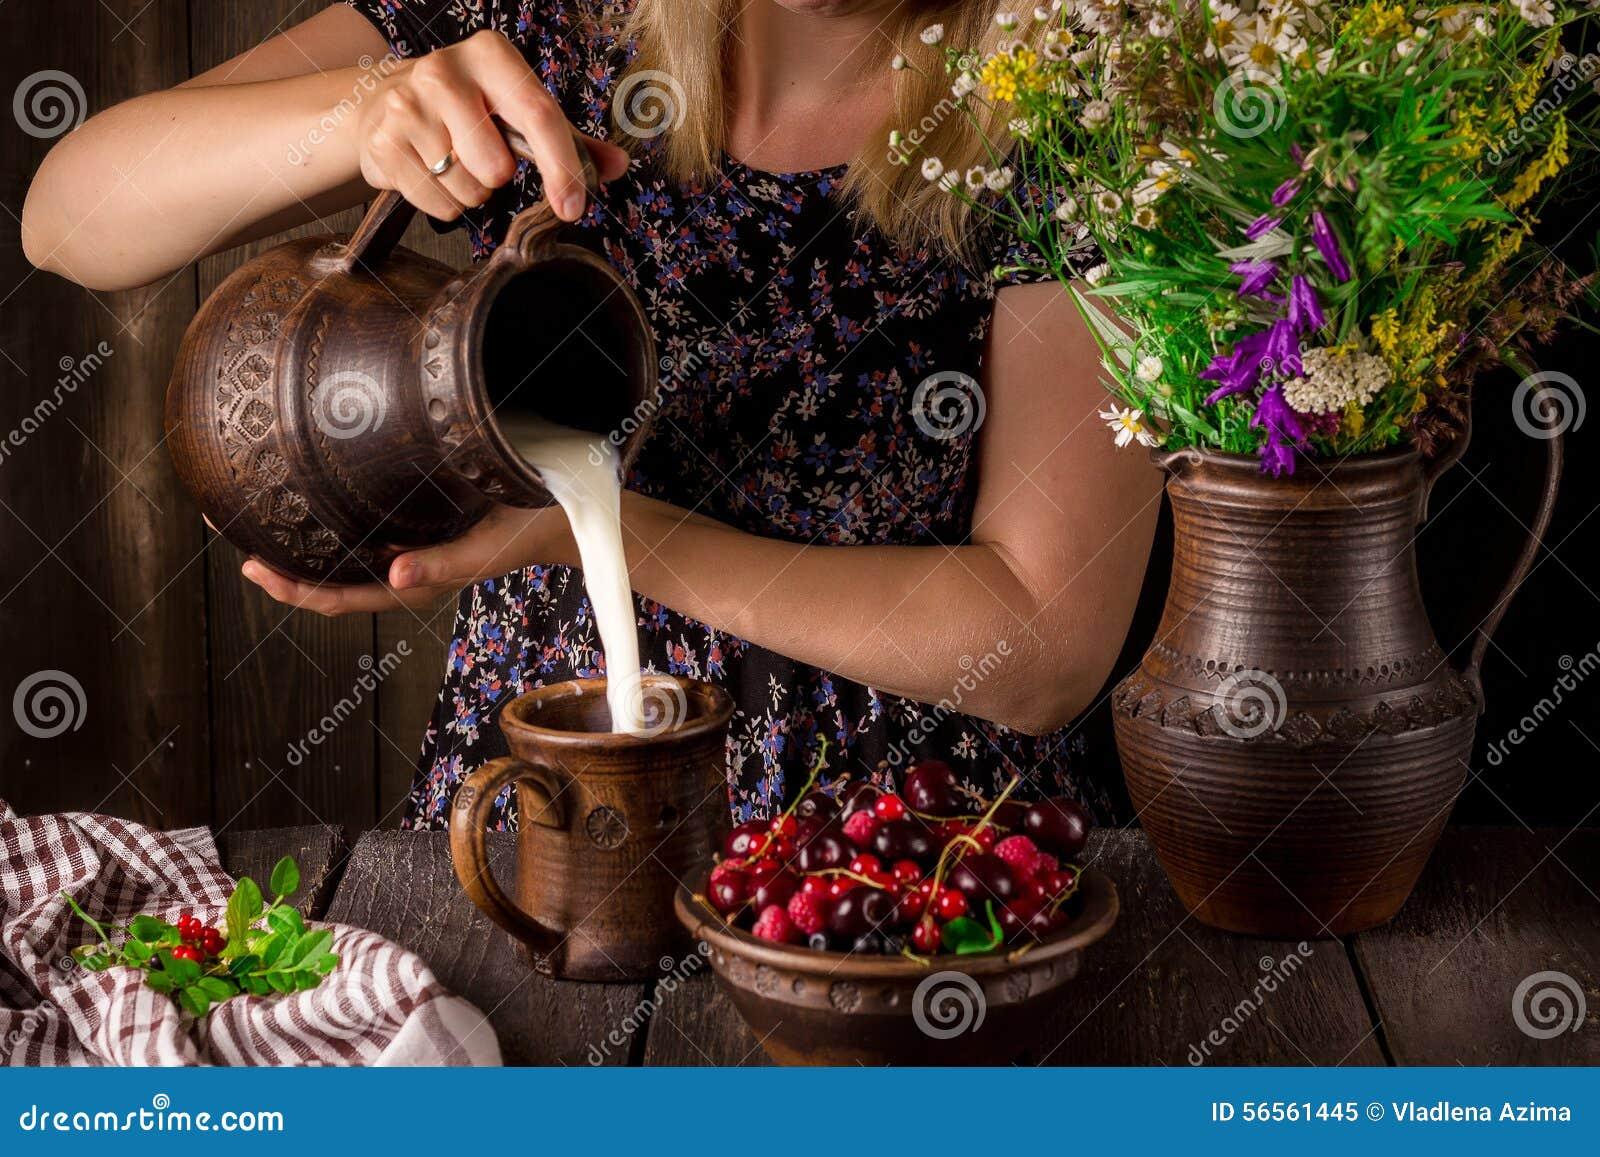 Download Το χύνοντας γάλα κοριτσιών από μια κανάτα σε ένα φλυτζάνι και ένα κύπελλο με τα μούρα σε έναν ξύλινο πίνακα κανάτα λουλουδιών Στοκ Εικόνα - εικόνα από εύθυμος, αγροτικός: 56561445